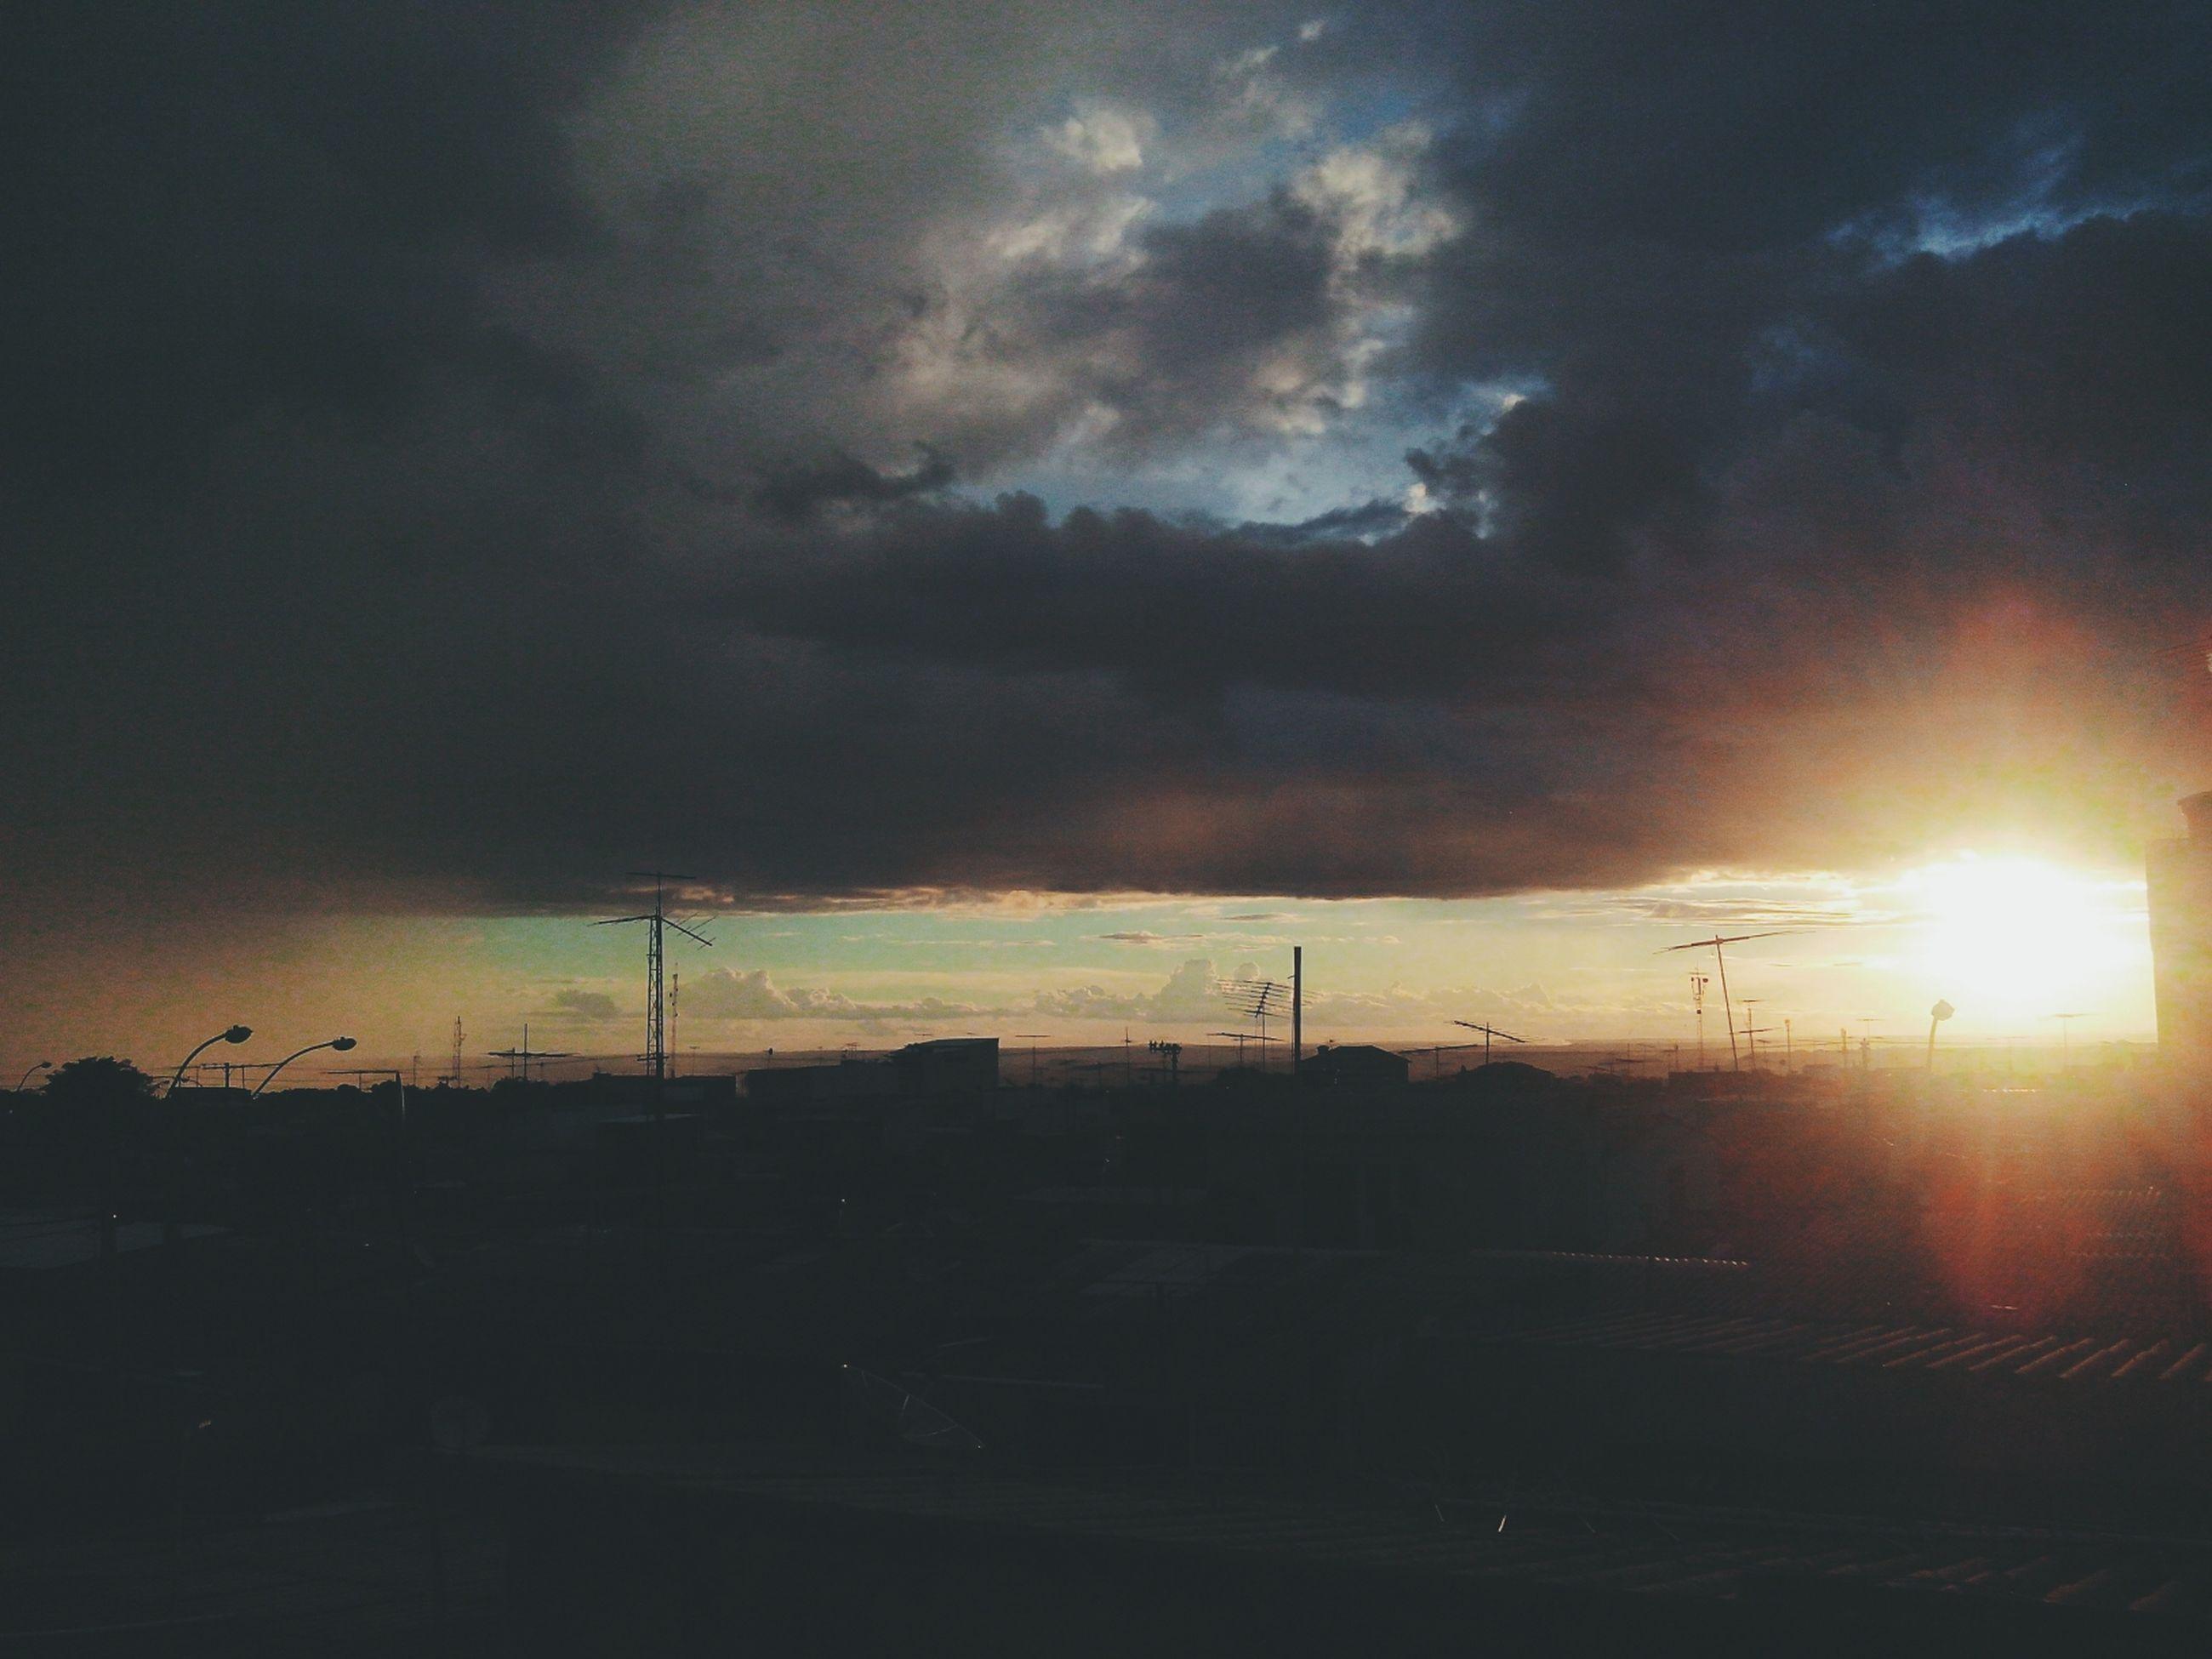 sky, cloud - sky, sunset, cloudy, silhouette, weather, landscape, fuel and power generation, dramatic sky, overcast, nature, electricity pylon, storm cloud, cloud, dusk, scenics, sun, transportation, outdoors, beauty in nature